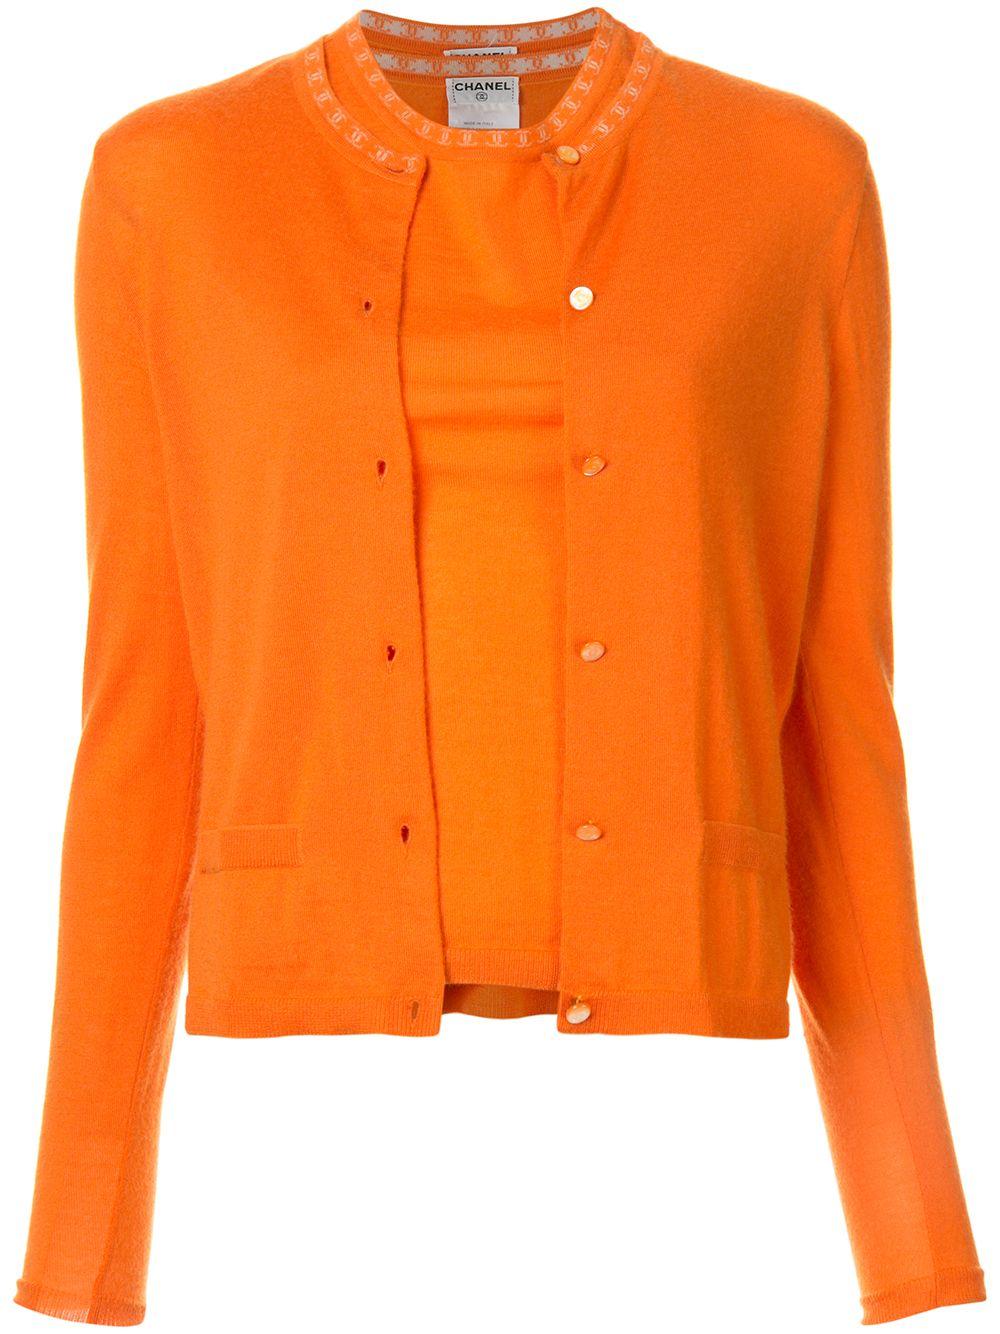 Columbia Tennessee Volunteers Tennessee Orange Super Bonehead Omni-Shade Shirt スポーツ用品 Columbia コロンビア